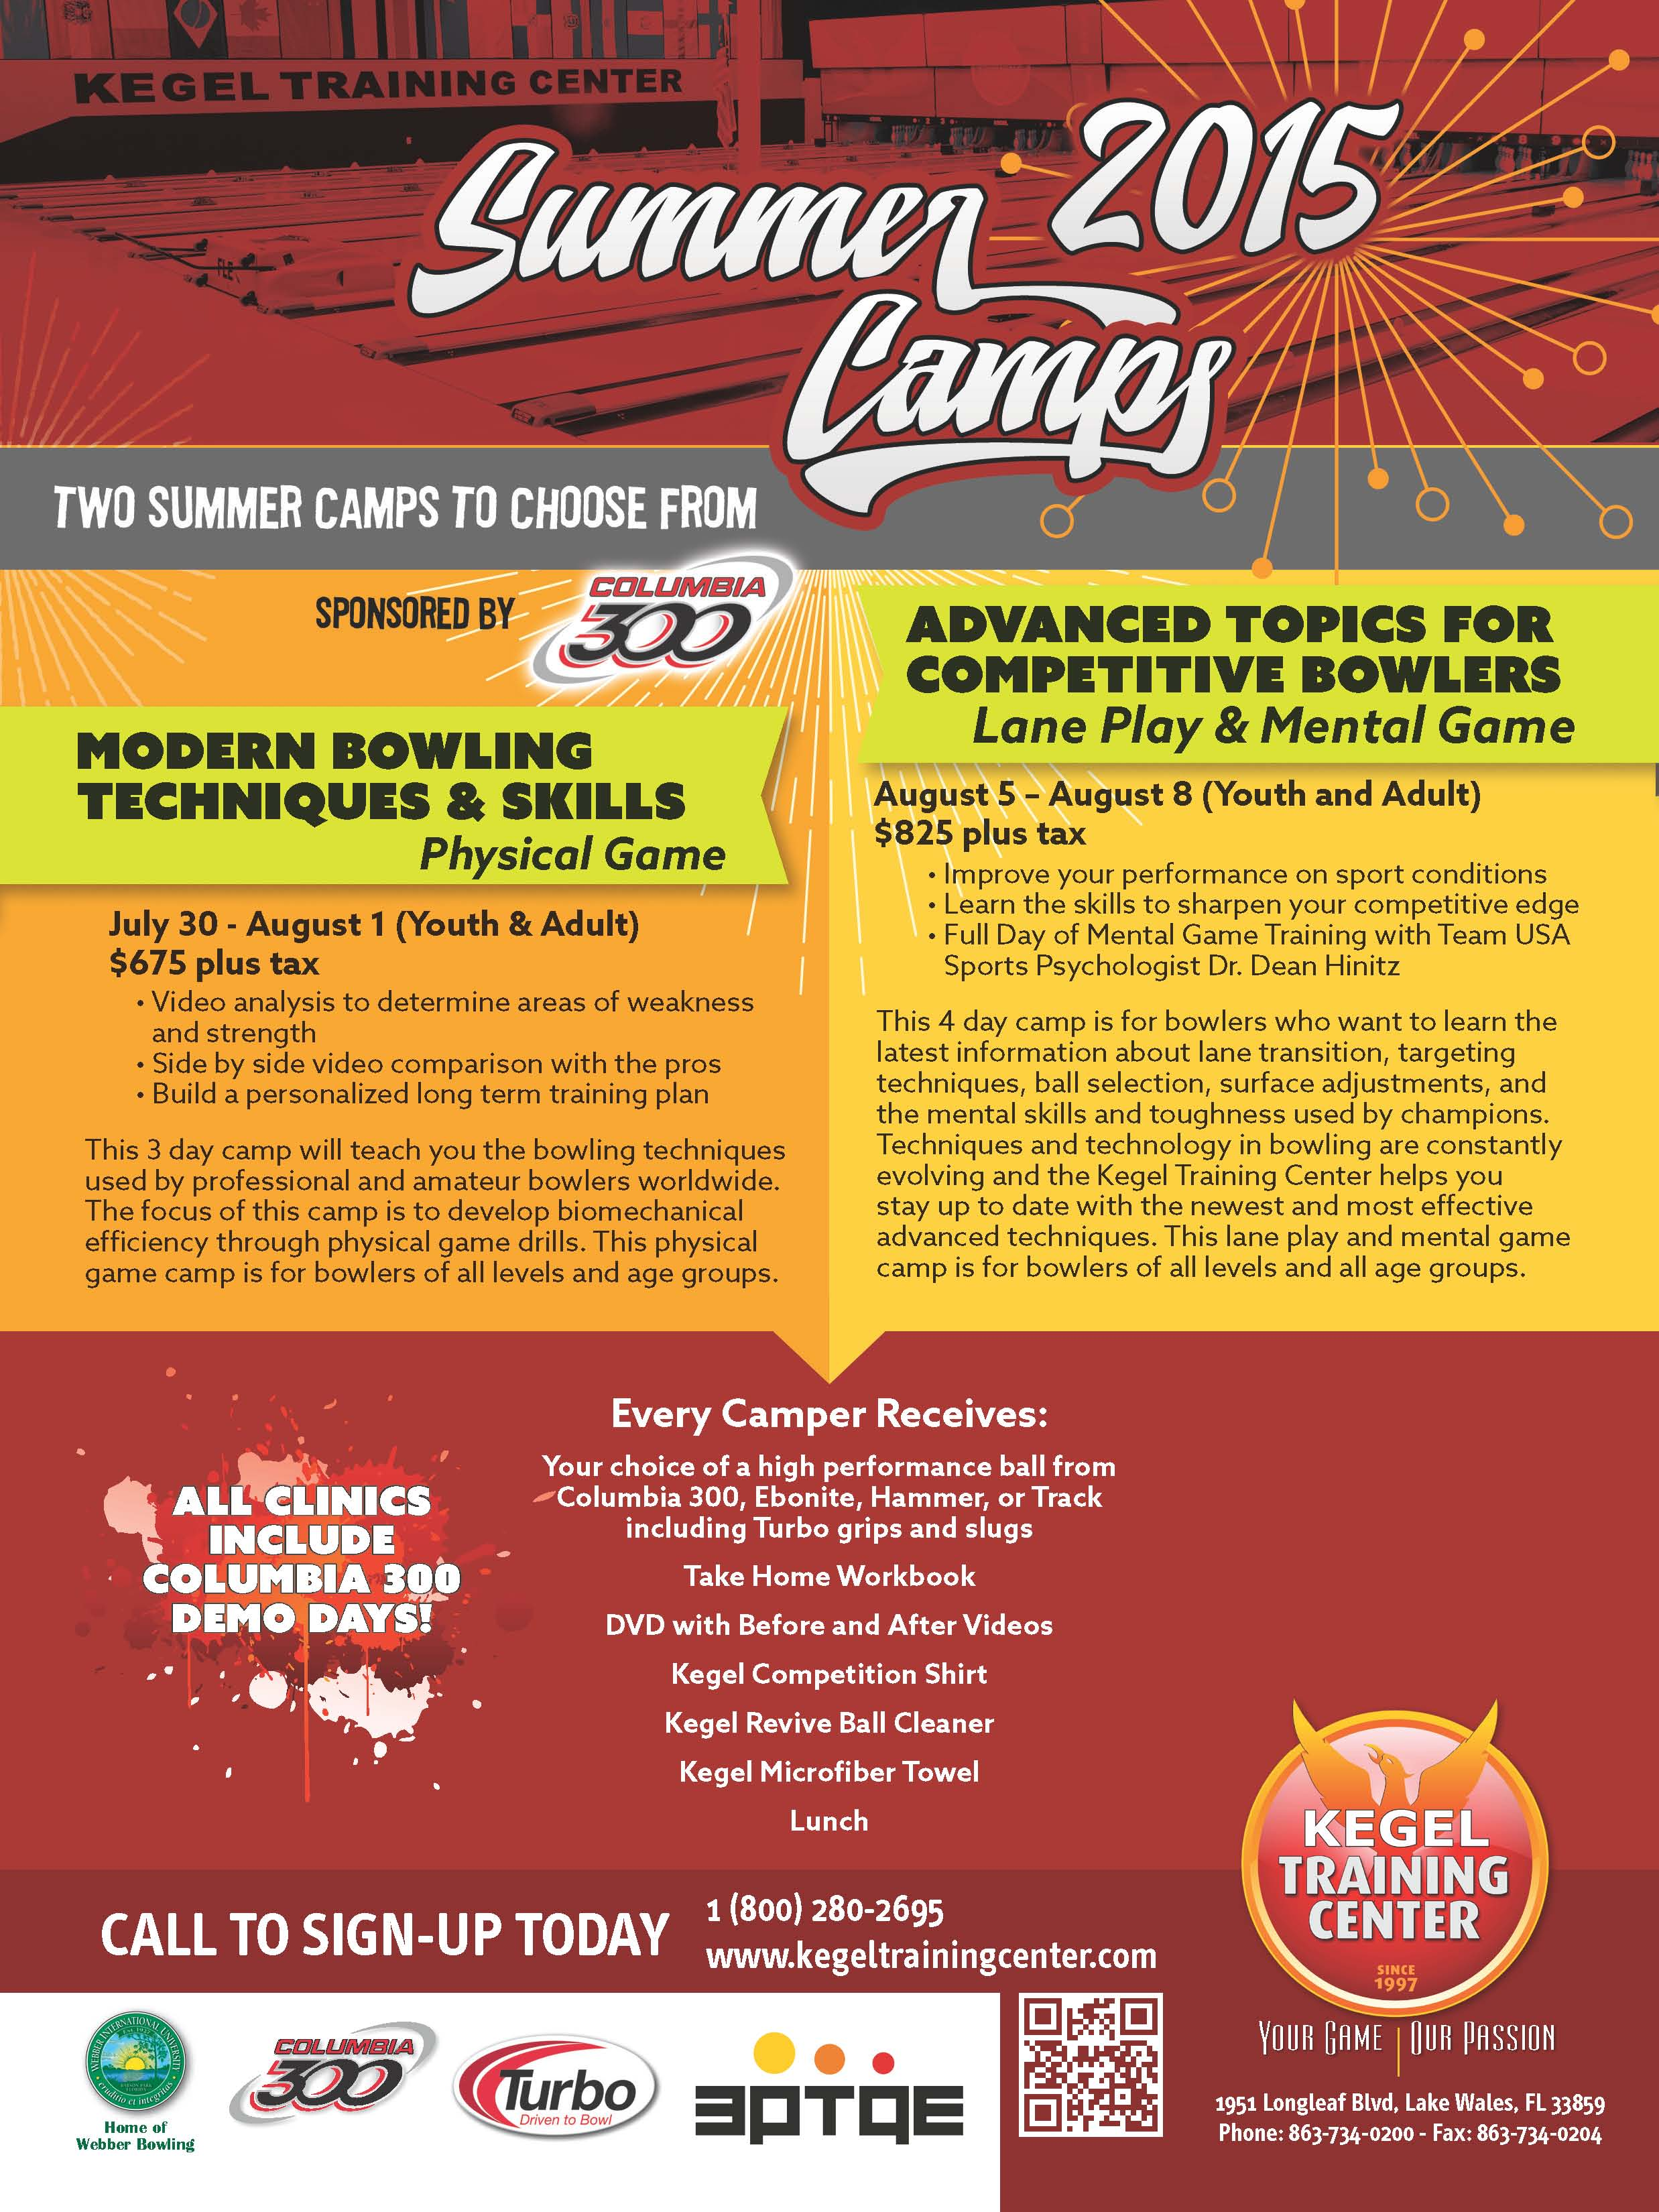 KegelSummerCamps2015